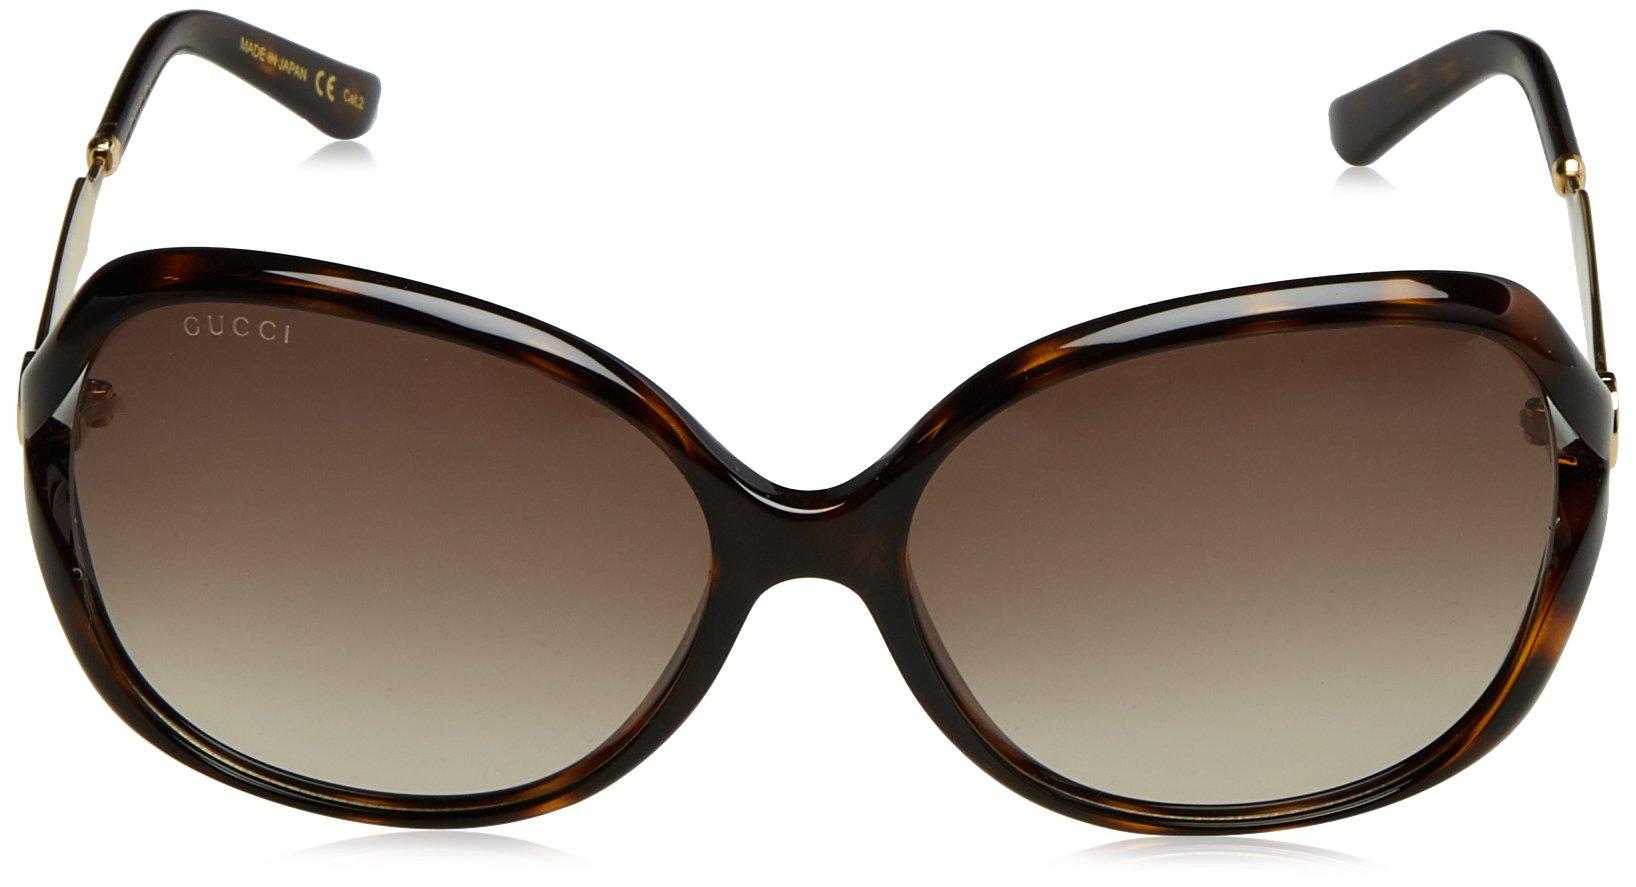 Best Gucci sunglasses 2019